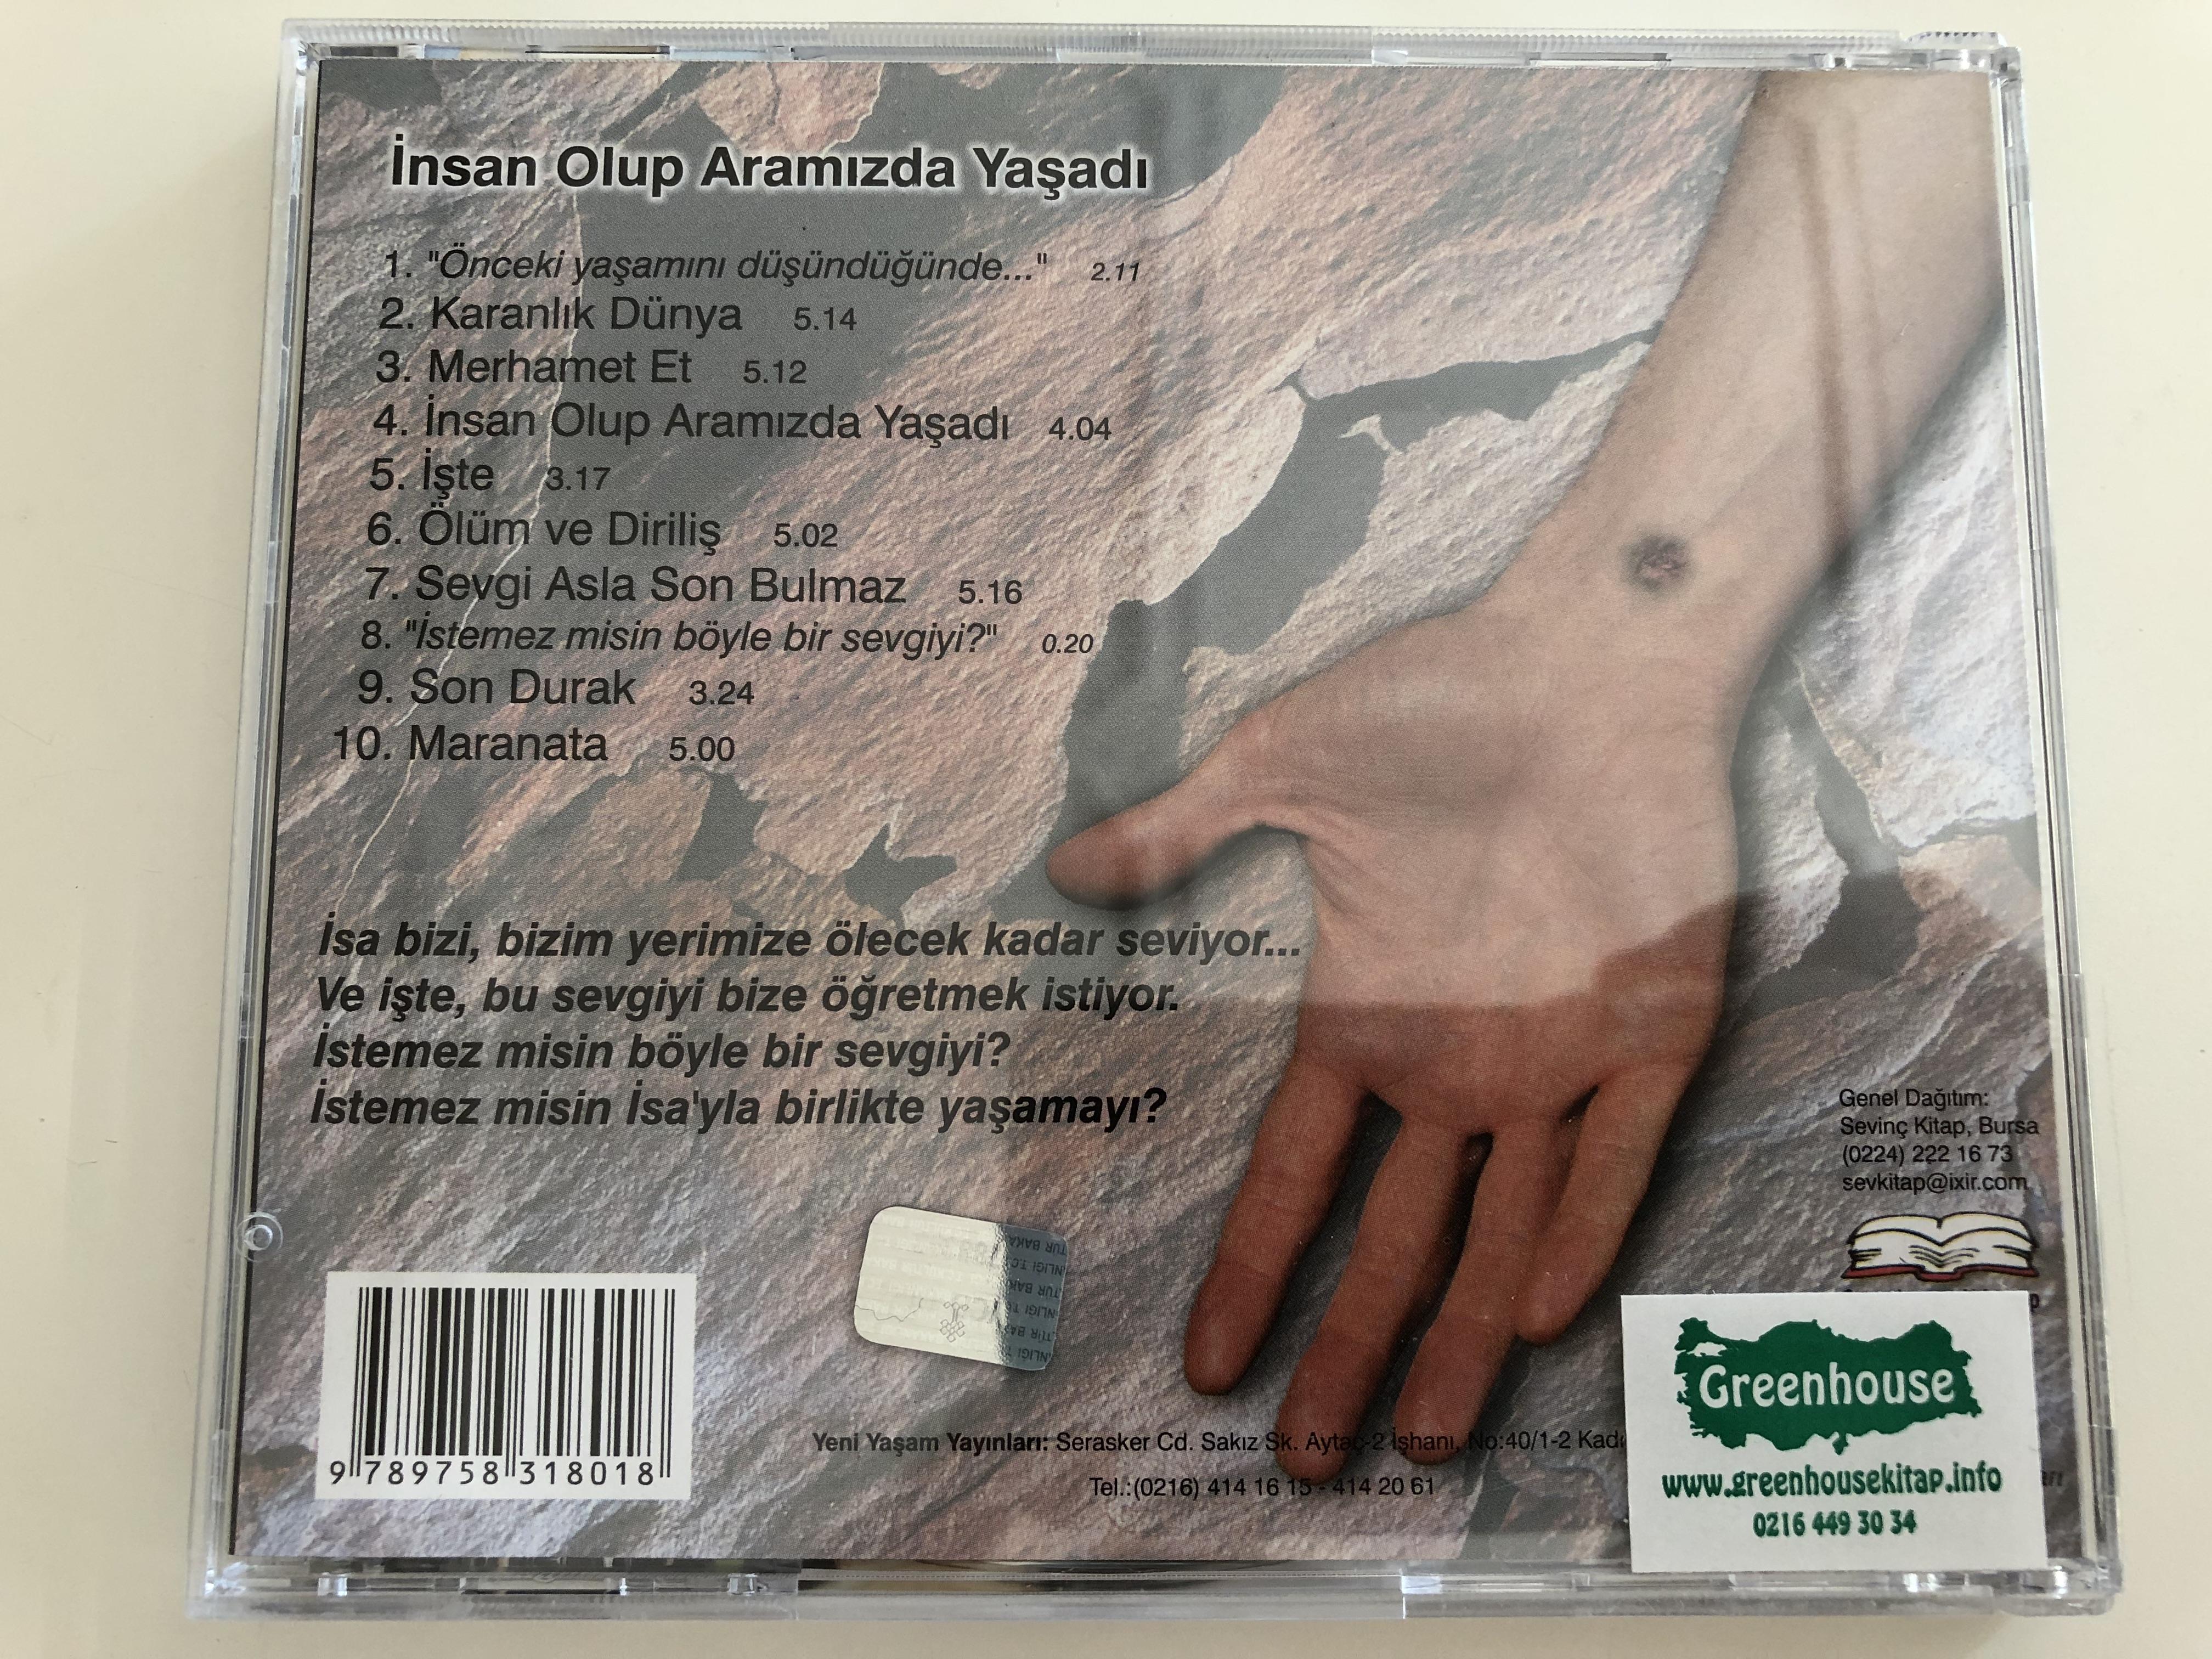 insan-olup-aramizda-ya-ad-turkish-christian-praise-and-worship-songs-audio-cd-2001-yeni-yasam-yayinlari-7-.jpg